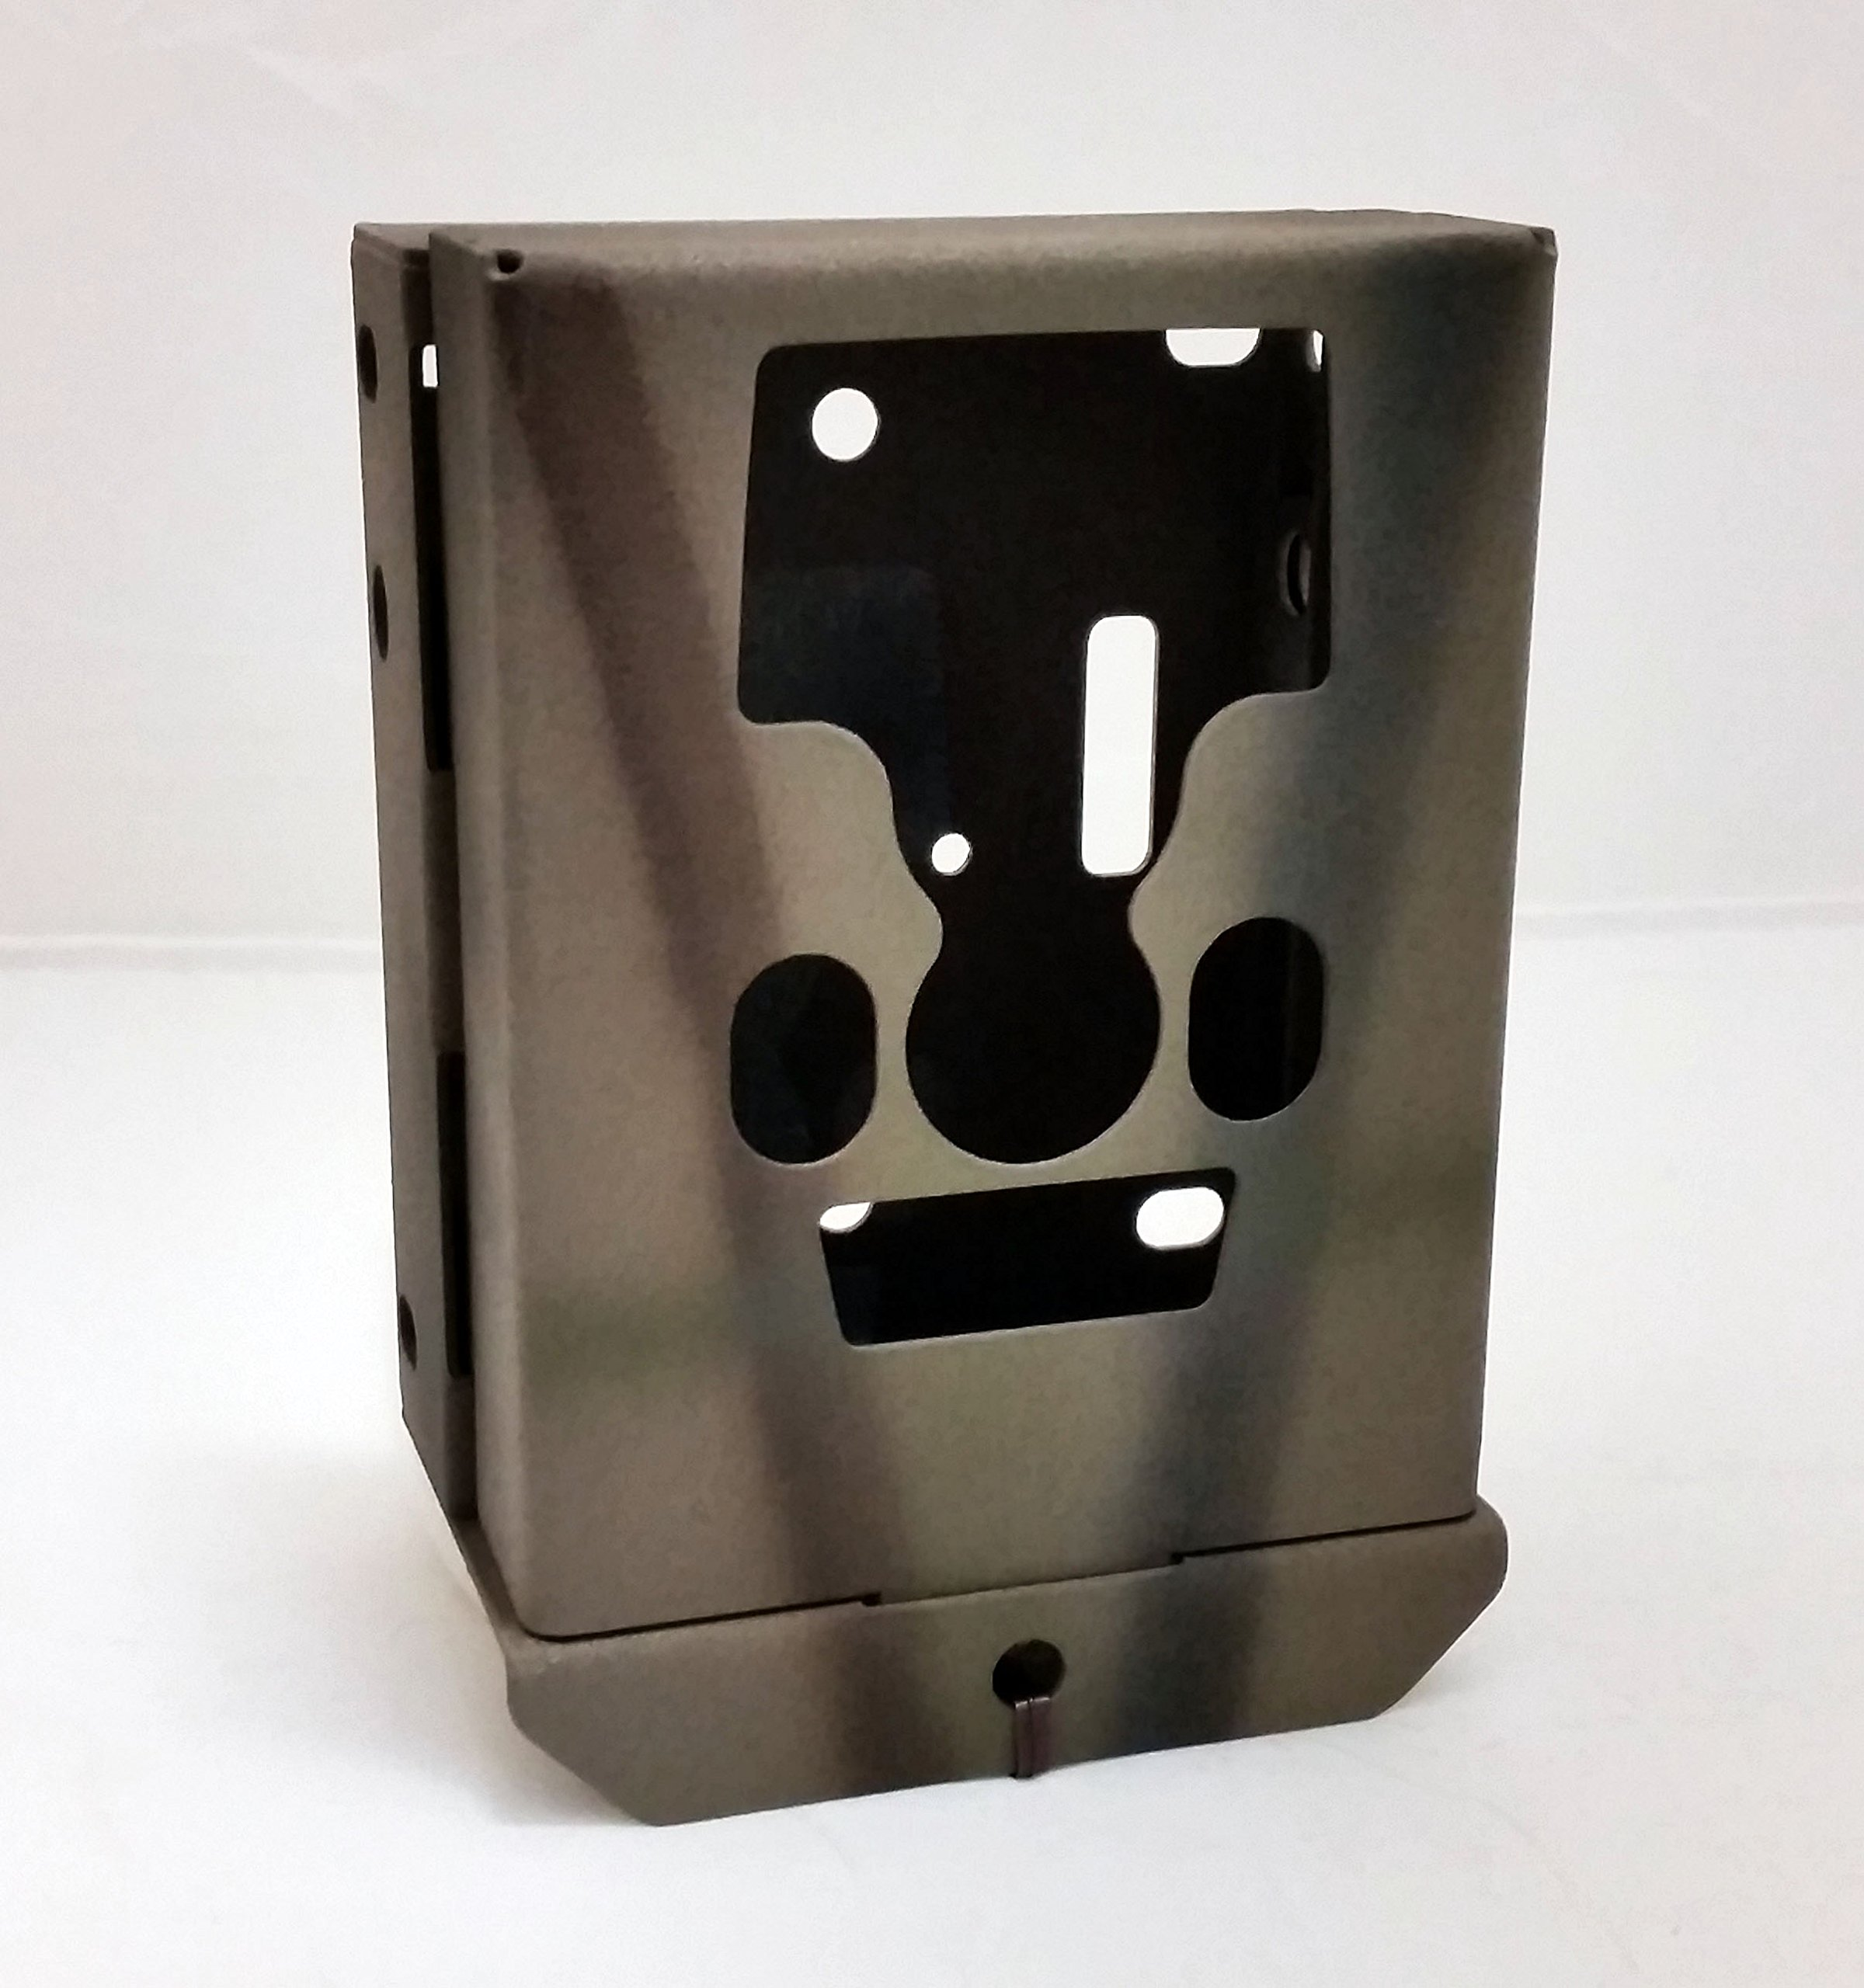 Camlockbox Security Box Compatible with Wildgame Innovations Cloak 4 Cloak 6 Cloak 7 Cameras